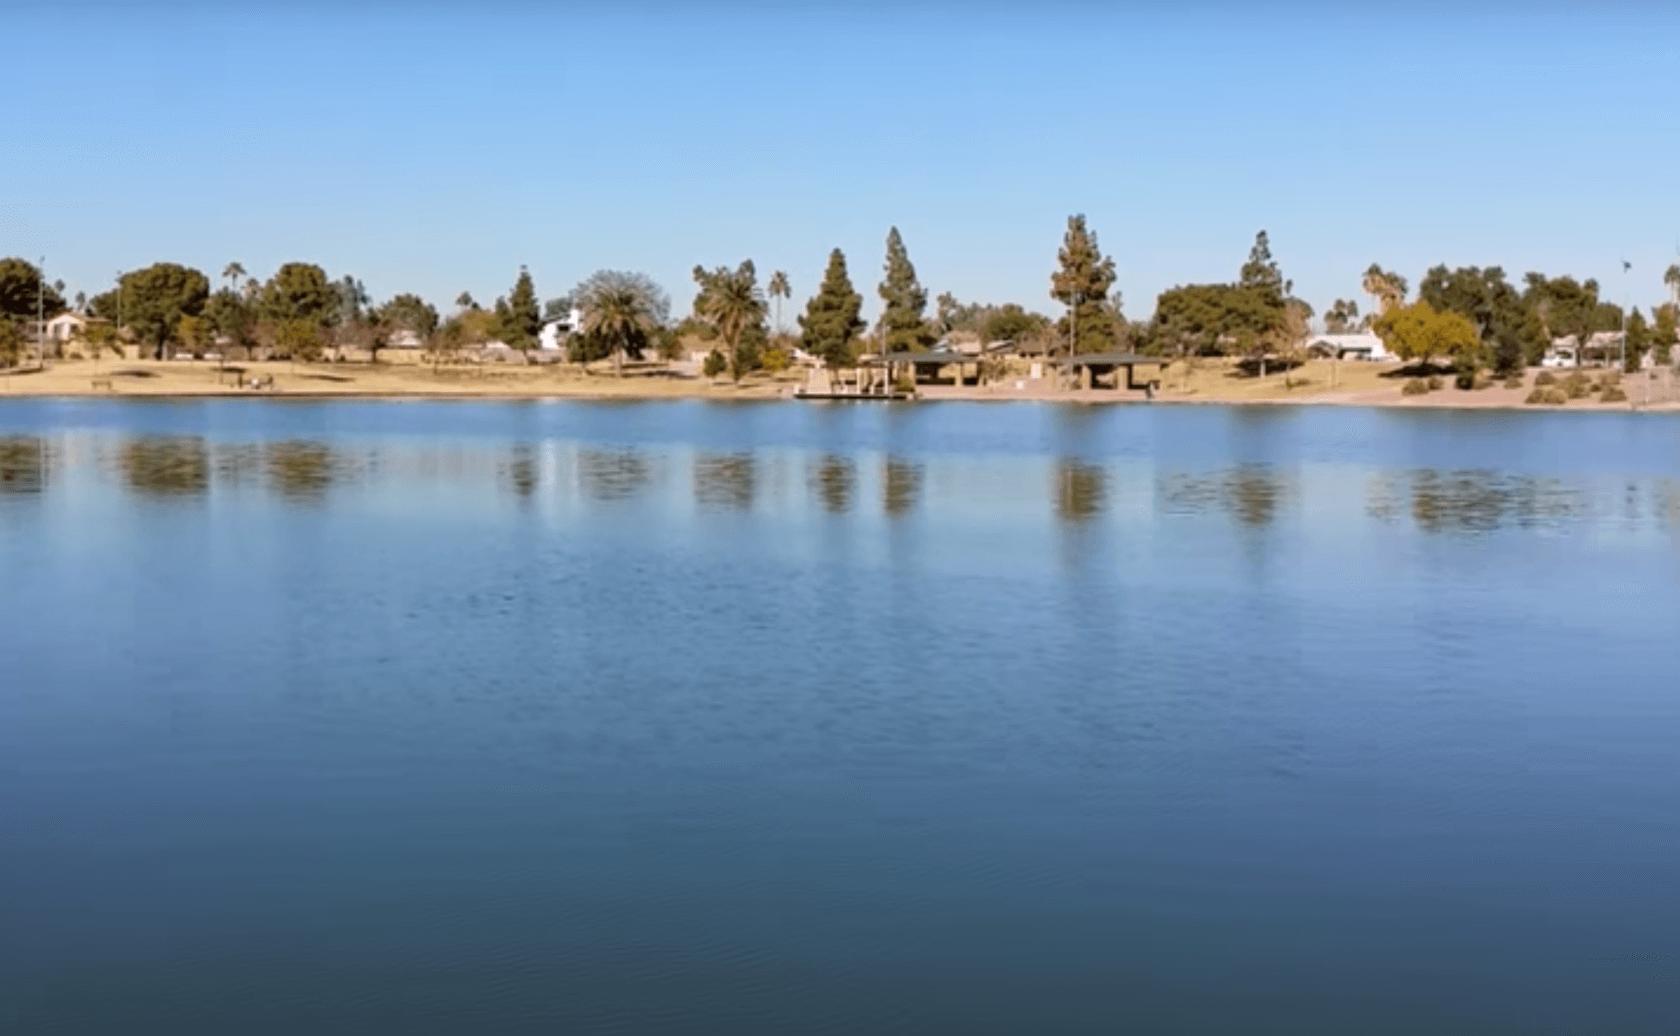 Kiwanis-Lake-Fishing-Guide-Tempe-AZ-04